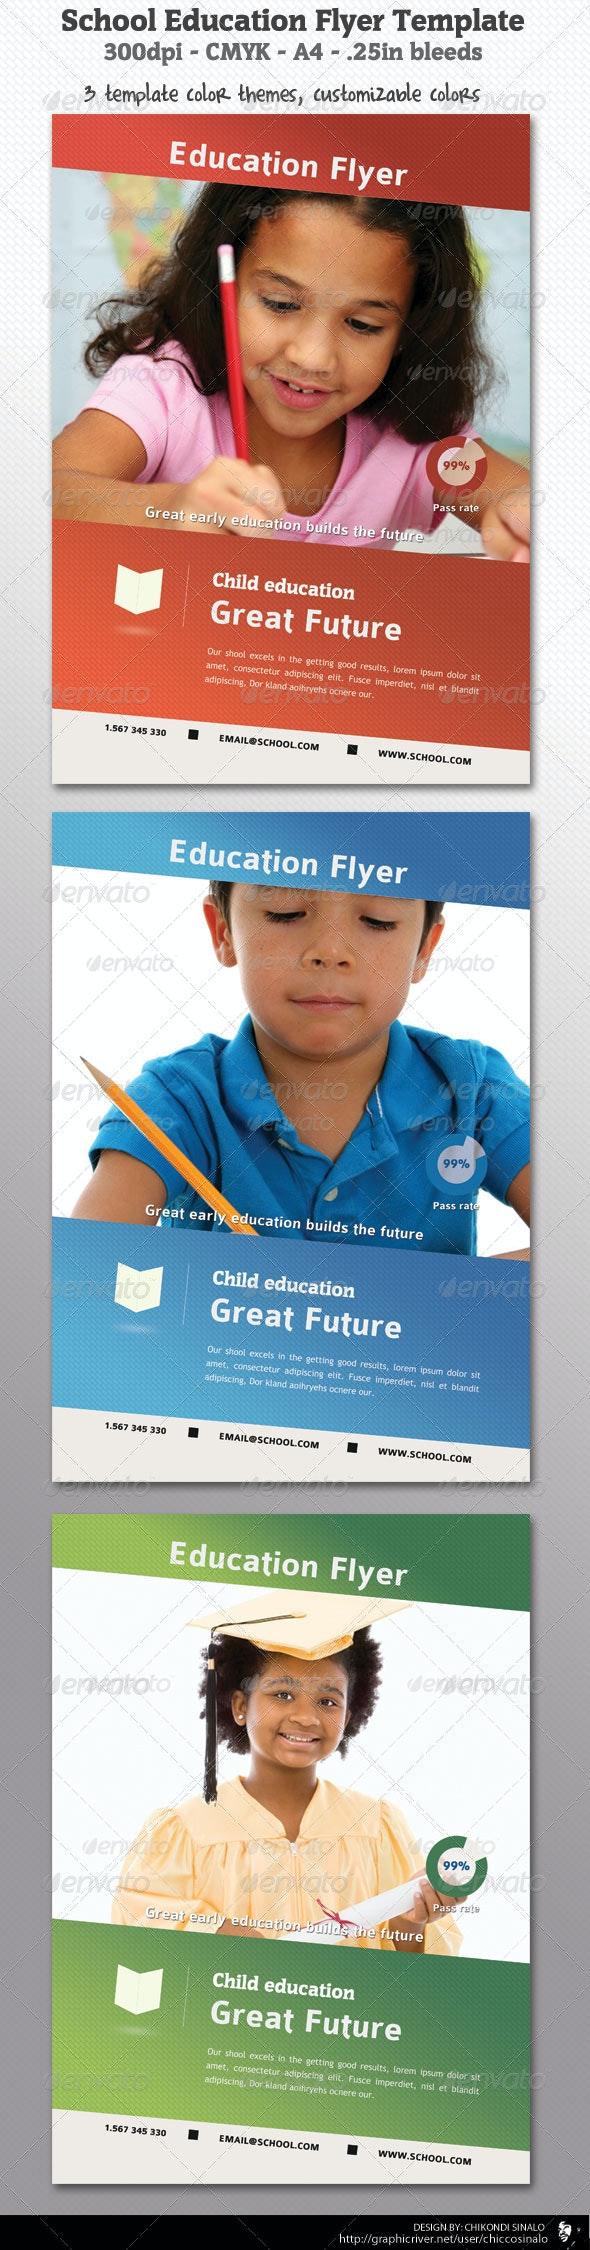 School Education Flyer Template - Flyers Print Templates